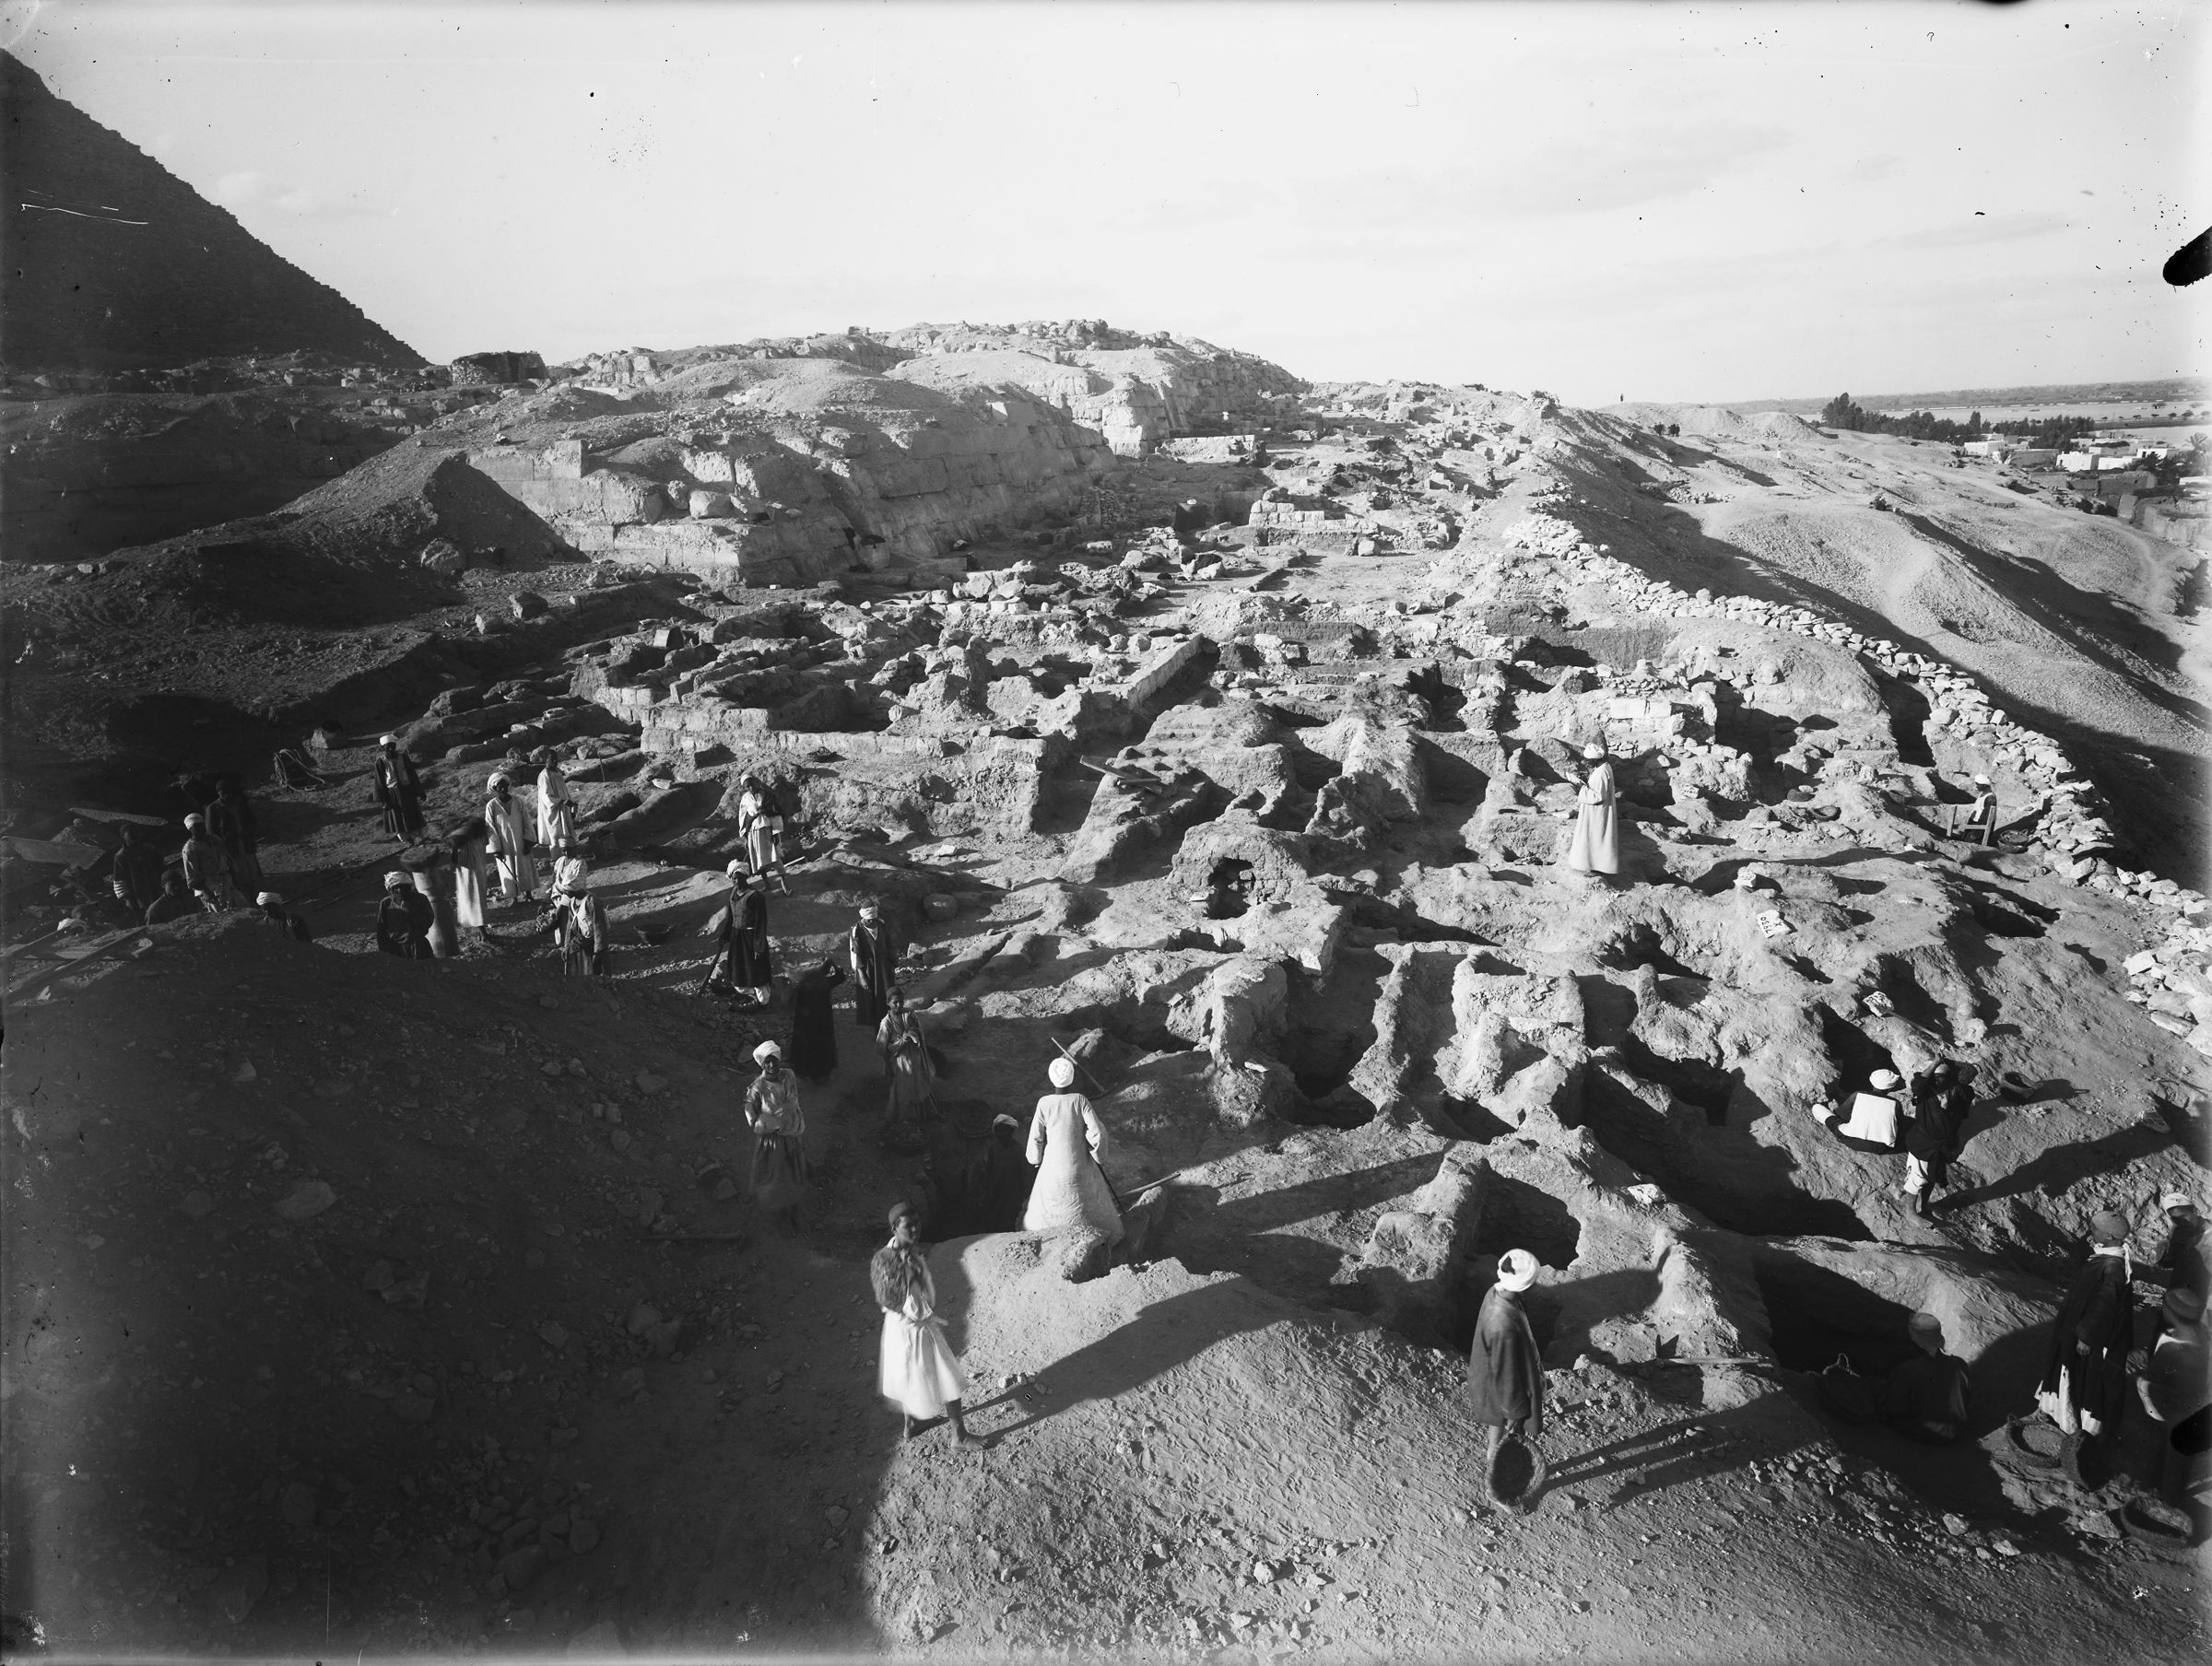 Eastern Cemetery: Site: Giza; View: G 7760, G 7931, G 7928+7929, G 7932, G 7911, G 7912, G 7913, G 7769, G 7922